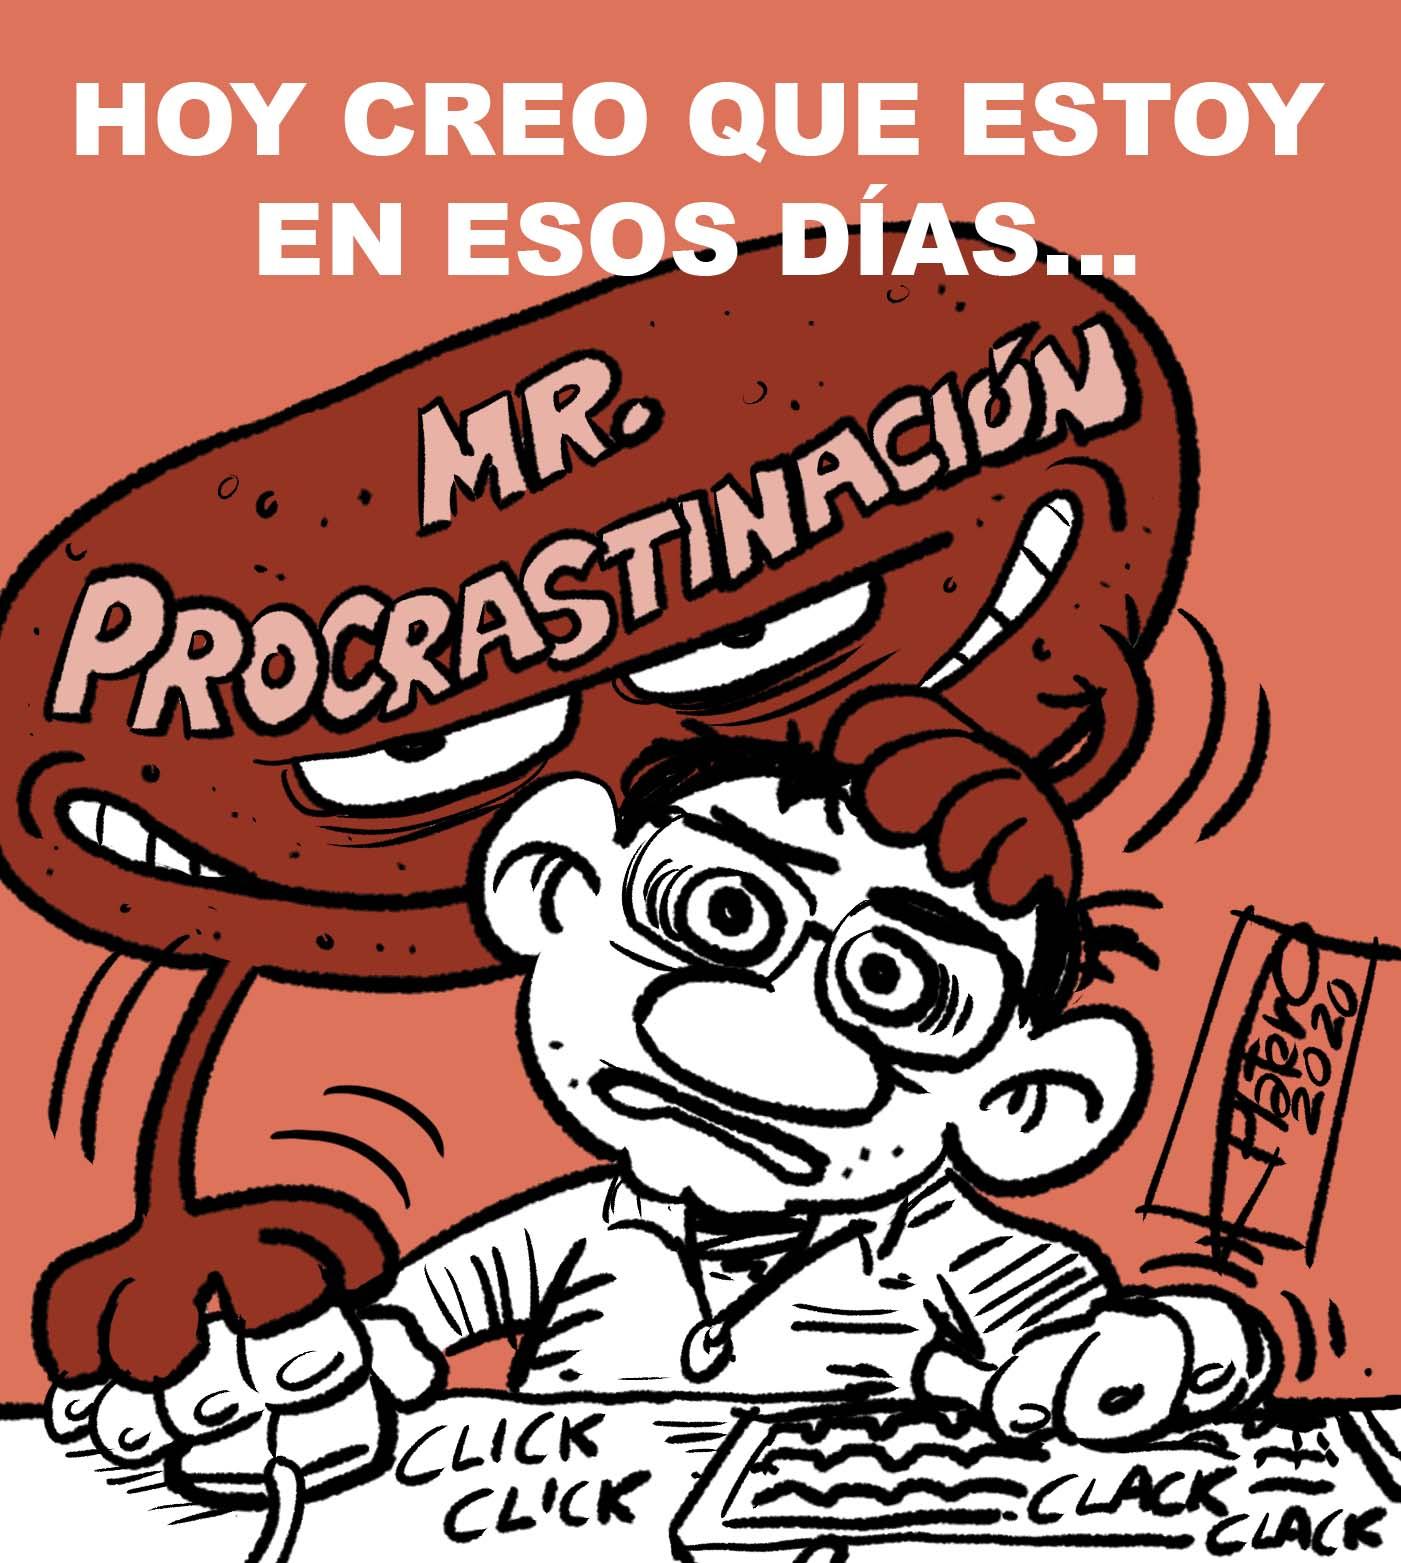 17_PROCRASTINACION_jose_luis_platero